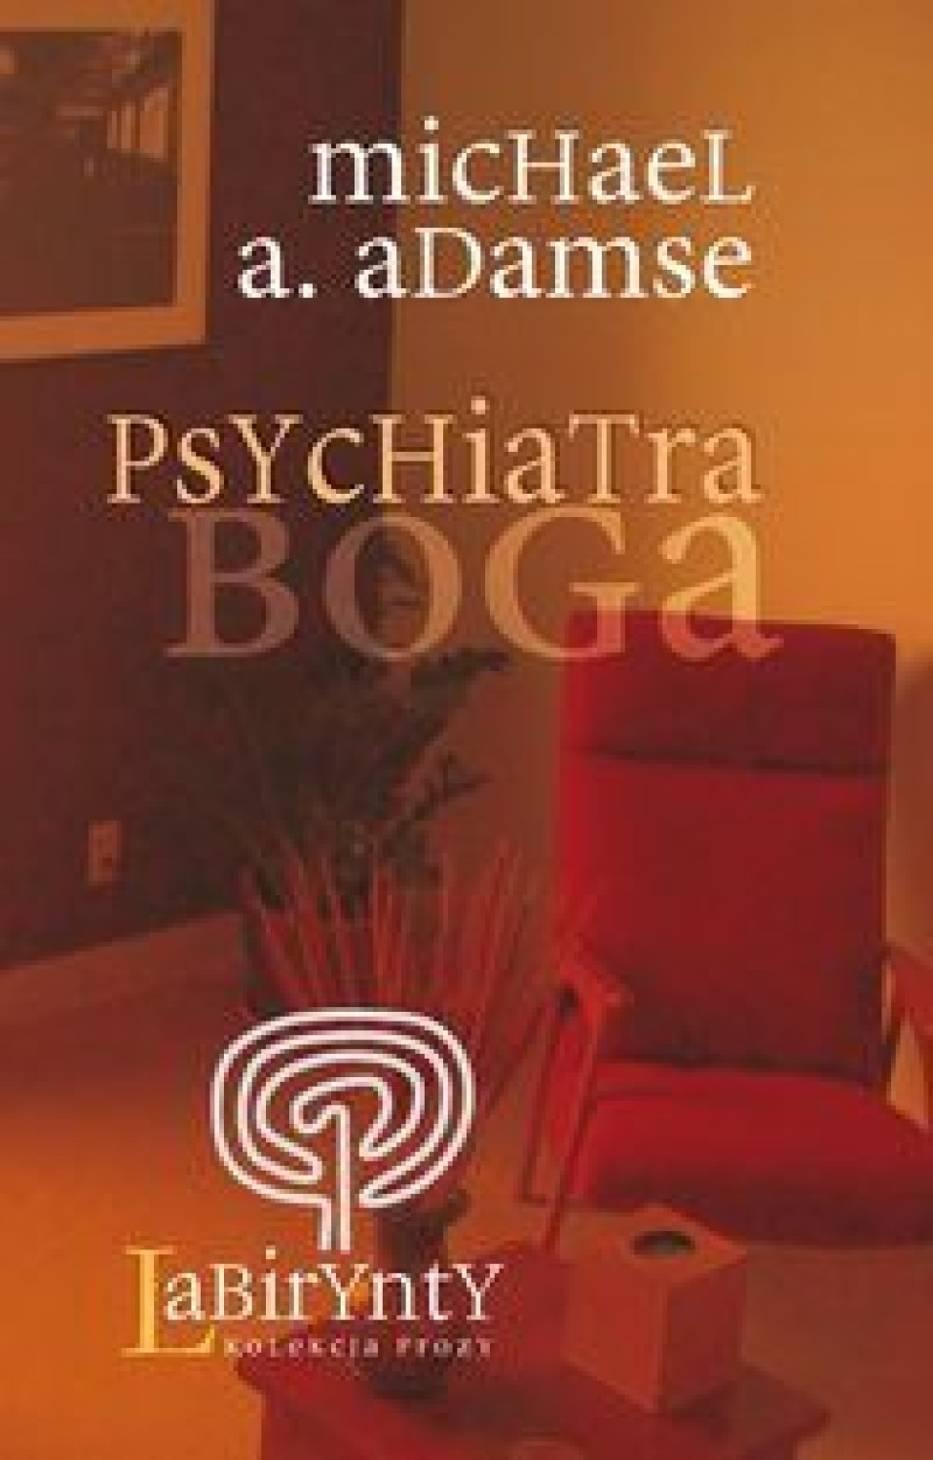 Psychiatra Boga